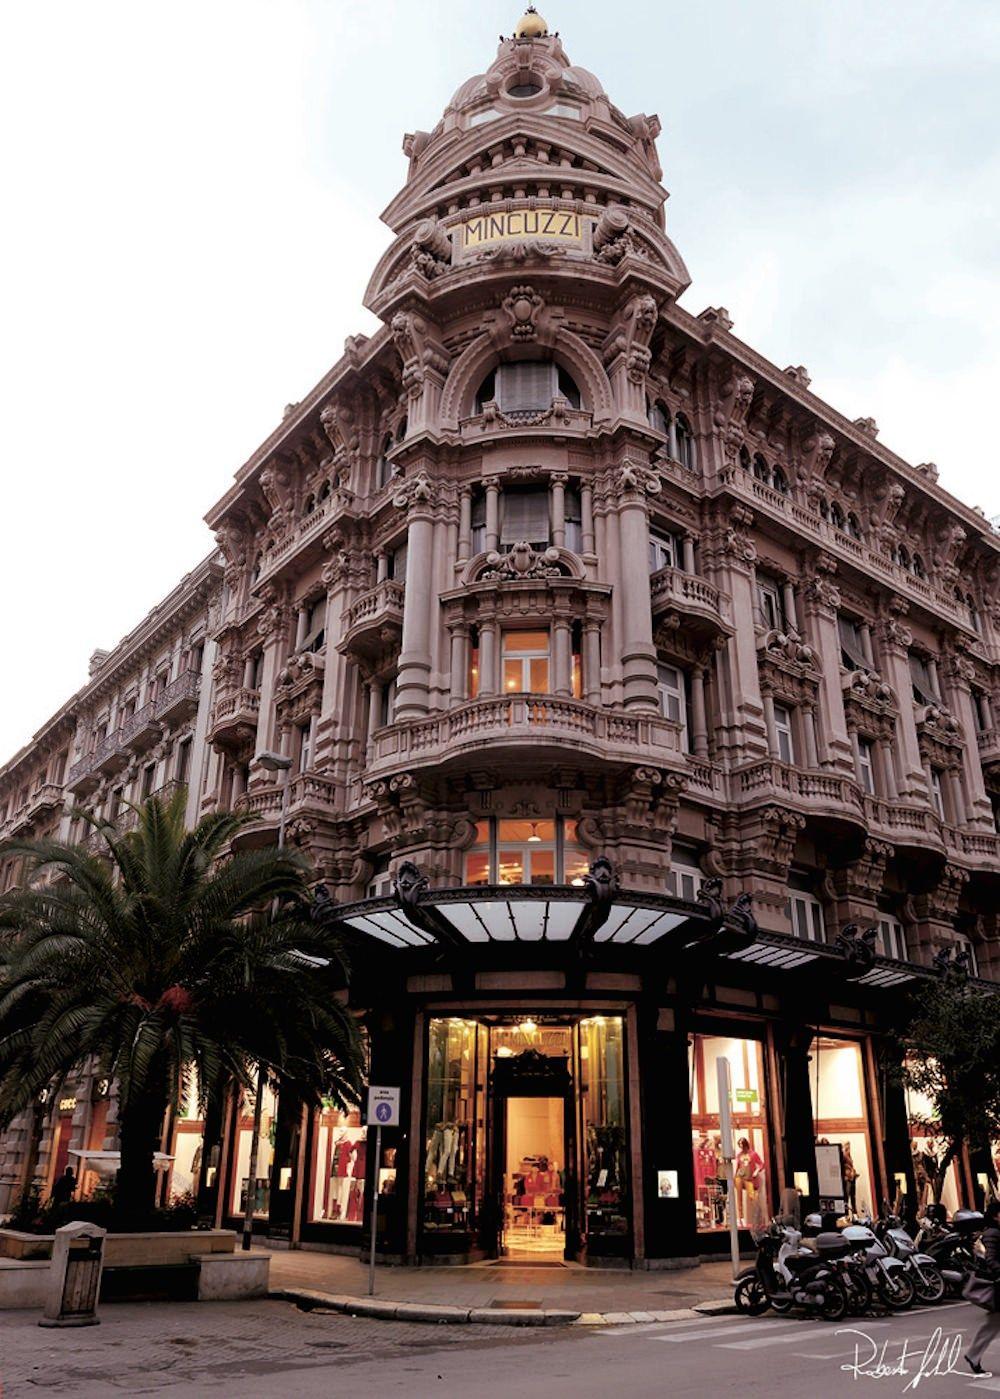 Palazzo Mincuzzi. Bari 34 | ✿ AROUND THE WORLD✿ | Pinterest ...